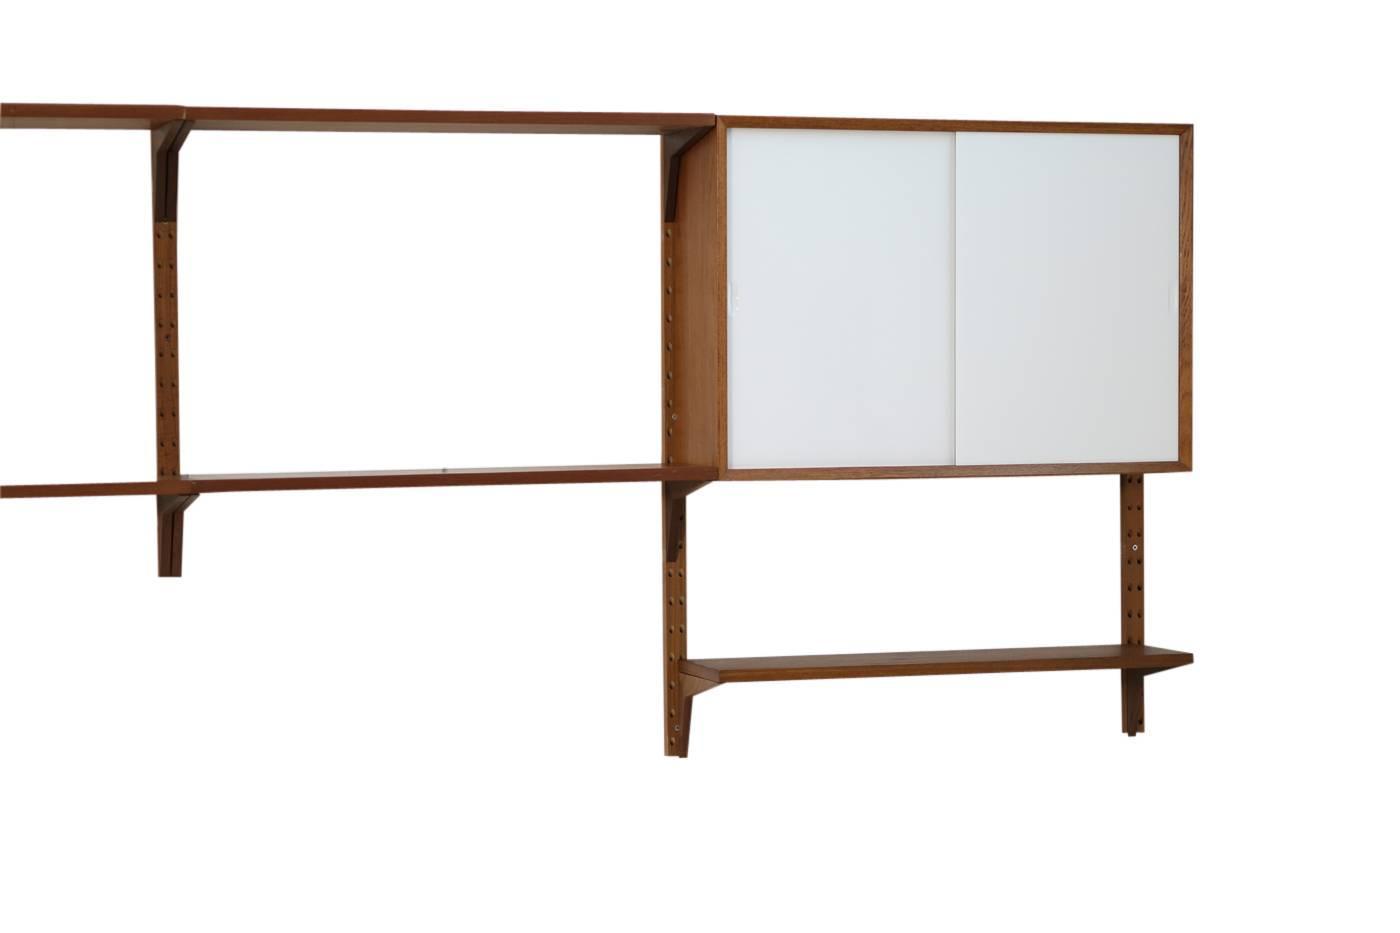 1960s poul cadovius teak wall unit by cado mid century. Black Bedroom Furniture Sets. Home Design Ideas